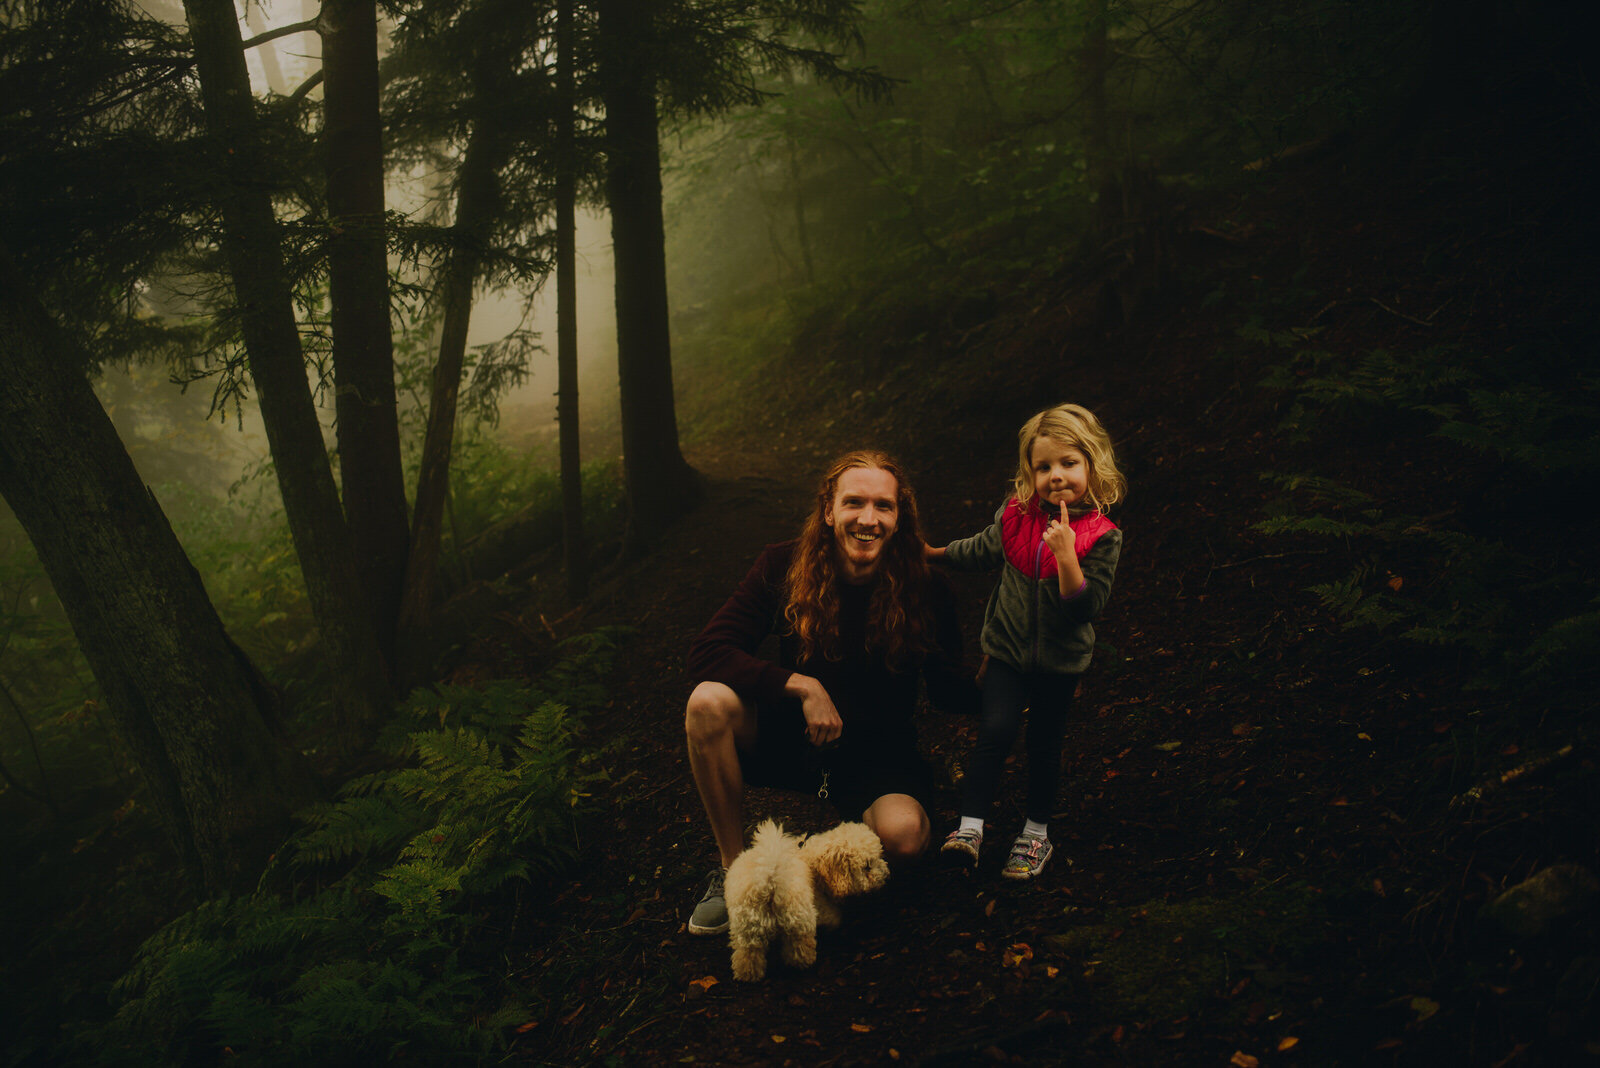 A Brief Family Photo